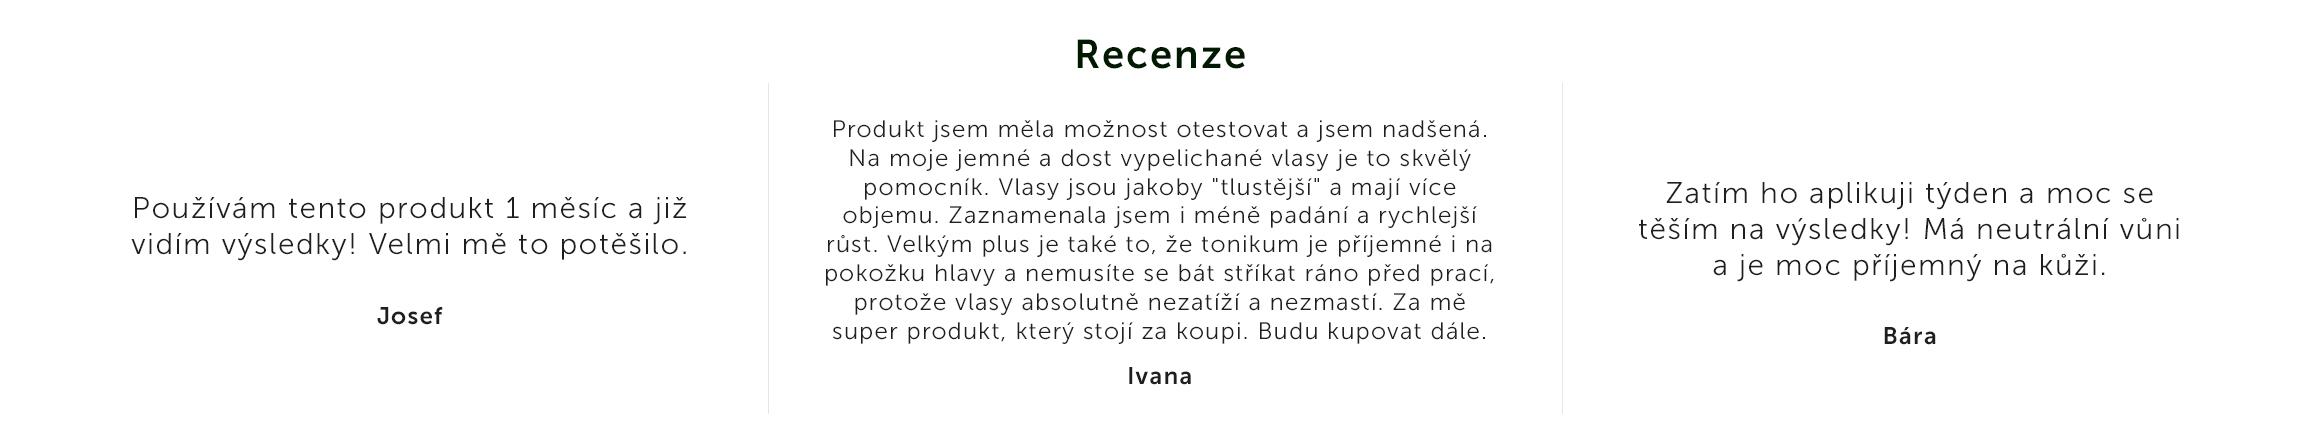 natucain-recenze